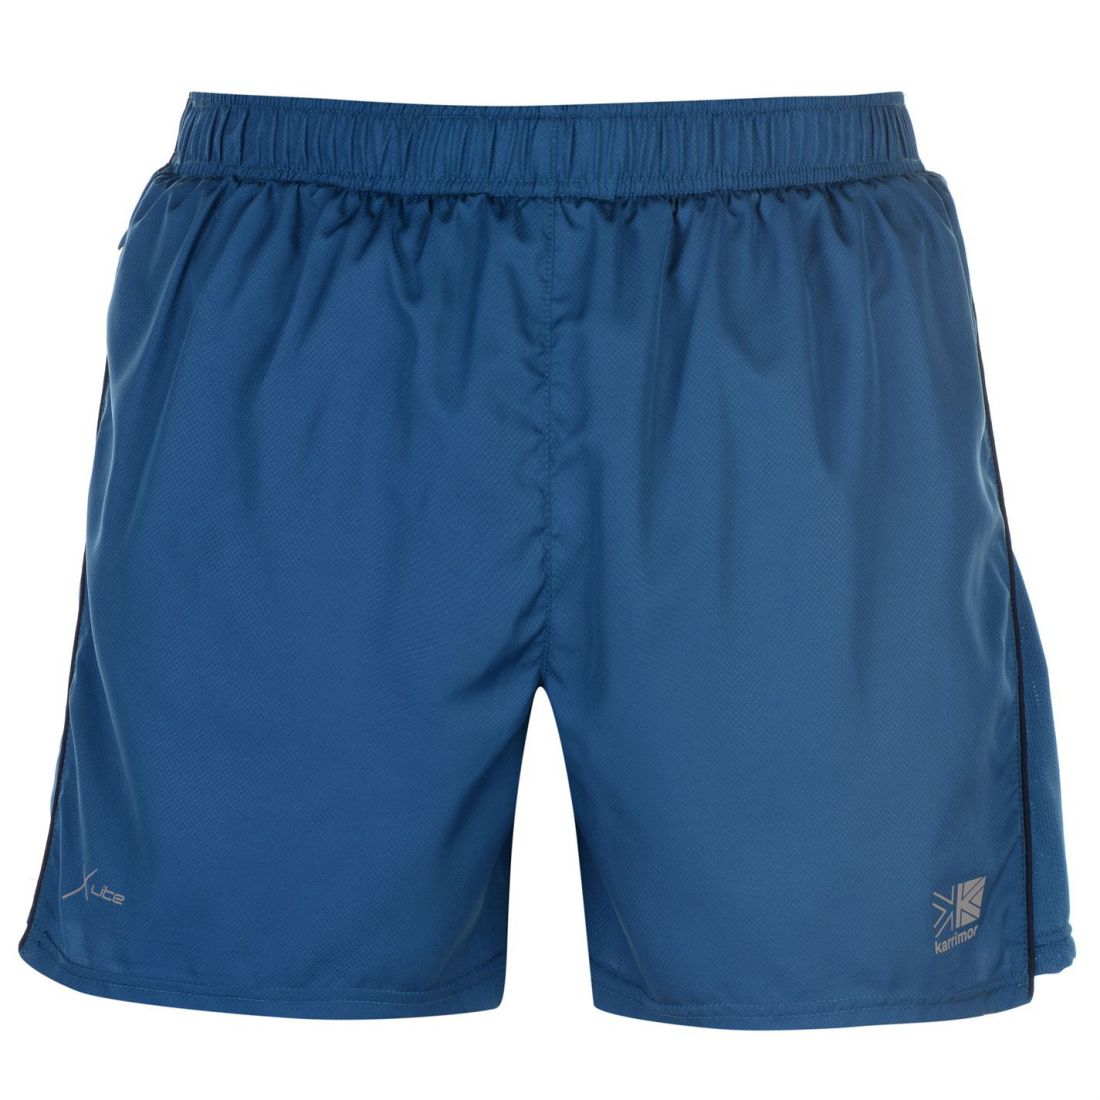 Karrimor-Xlite-5inch-Running-Shorts-Performance-Mens thumbnail 11